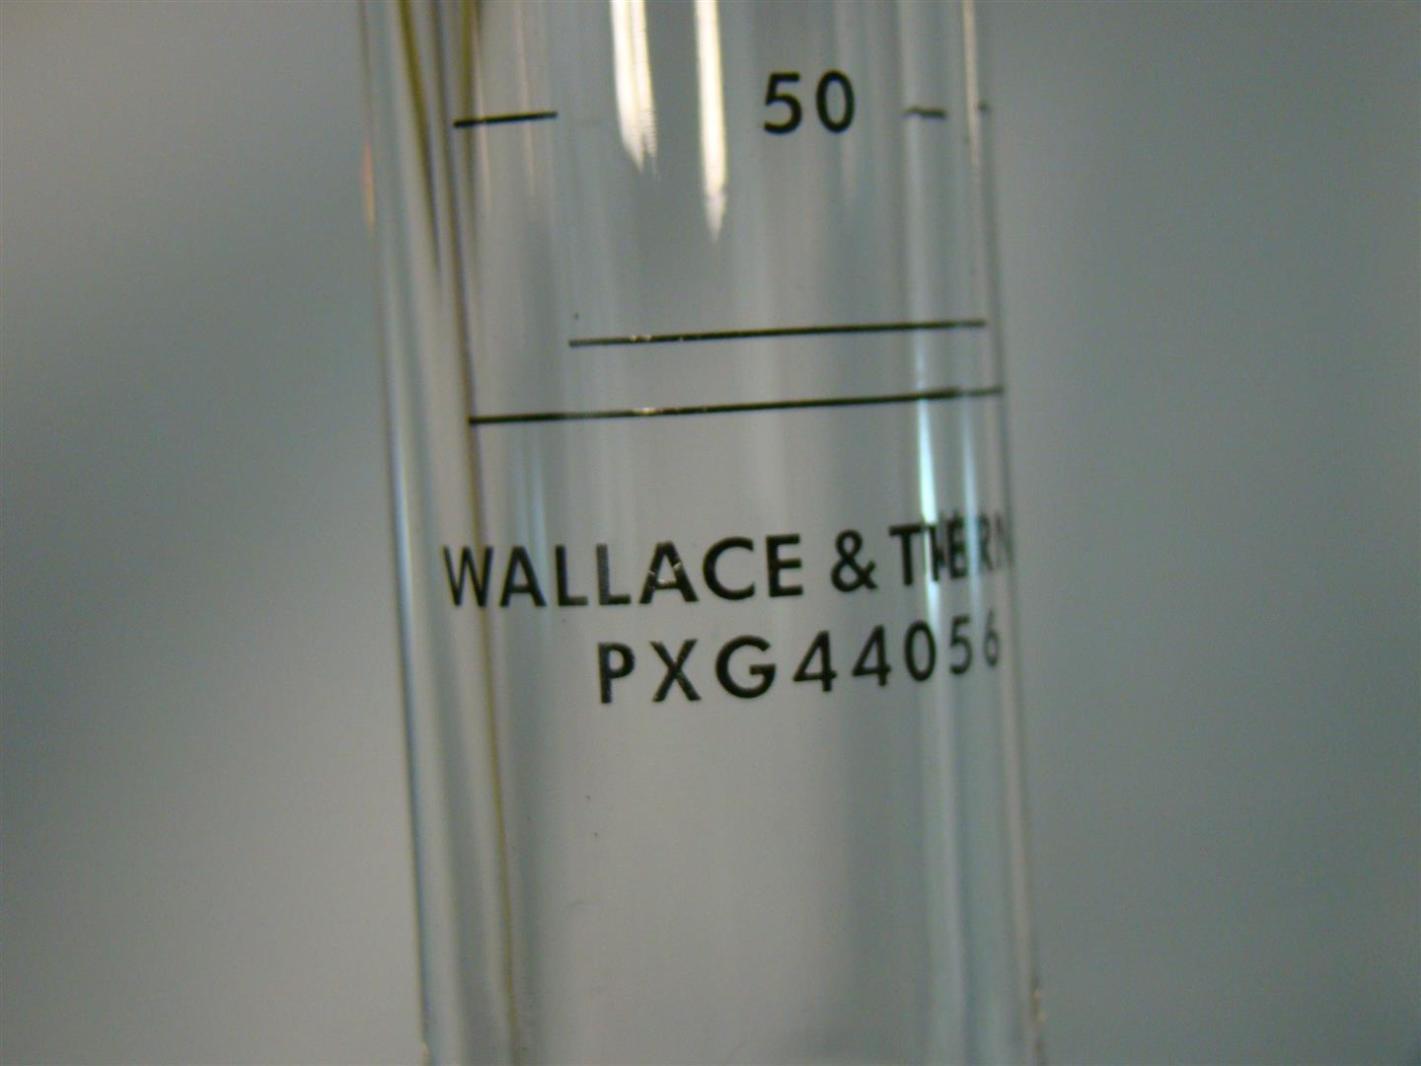 aht172-wallace-tiernan-w3t98231-glass-rotameter-unit-p-x-g-44056-4.jpg